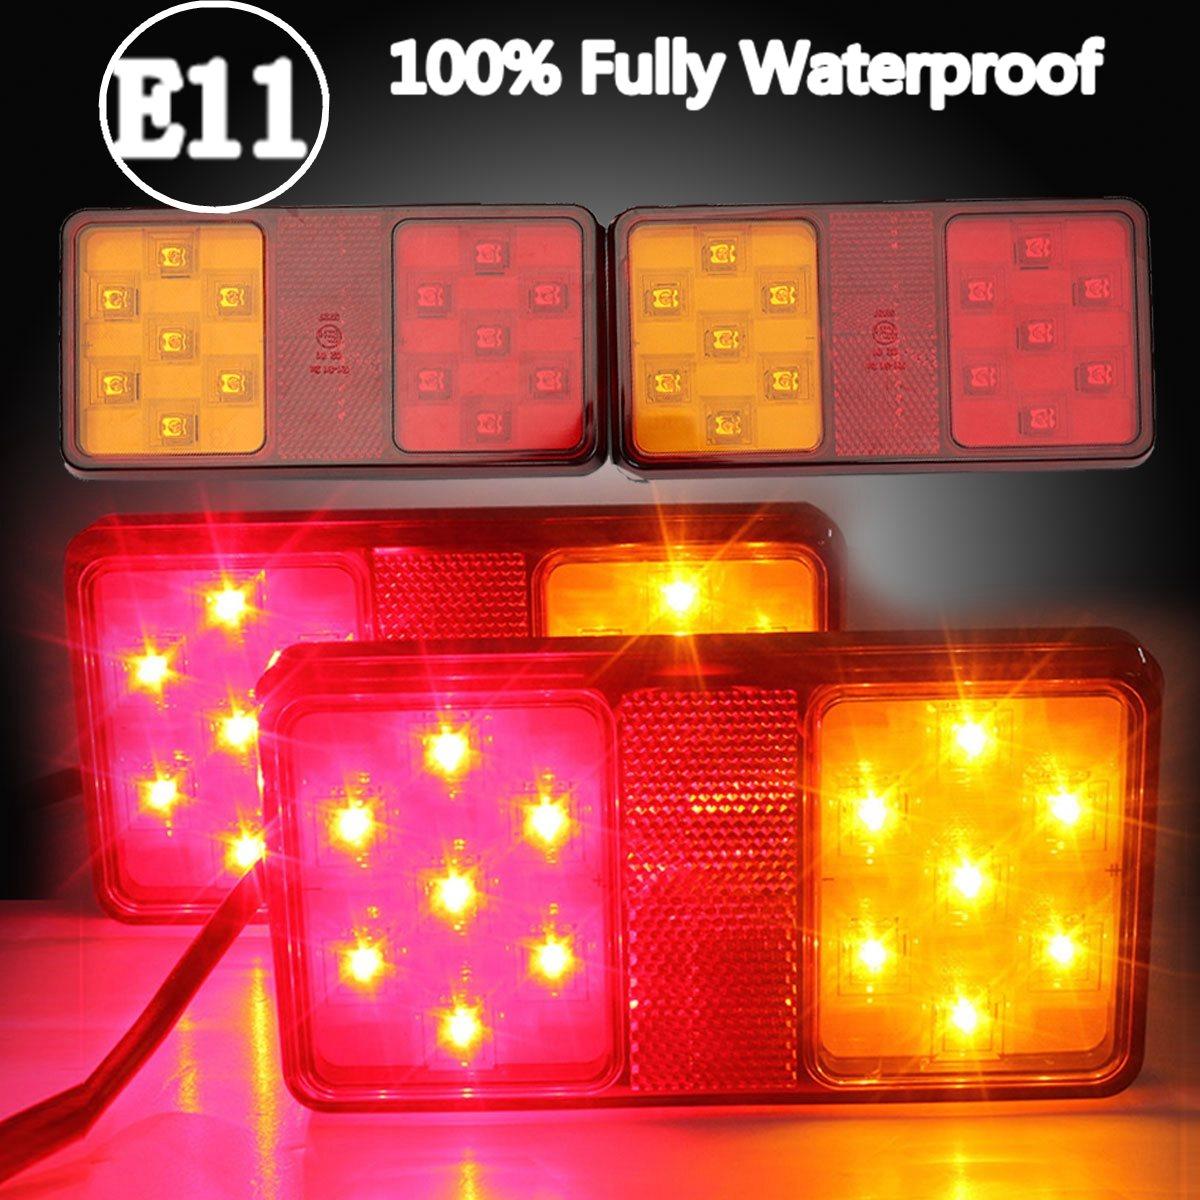 Audew 2 x 12V LED Rear Trailer Truck Tail Brake Stop Indicator Turn Signal Light Indicator Lamp(China (Mainland))